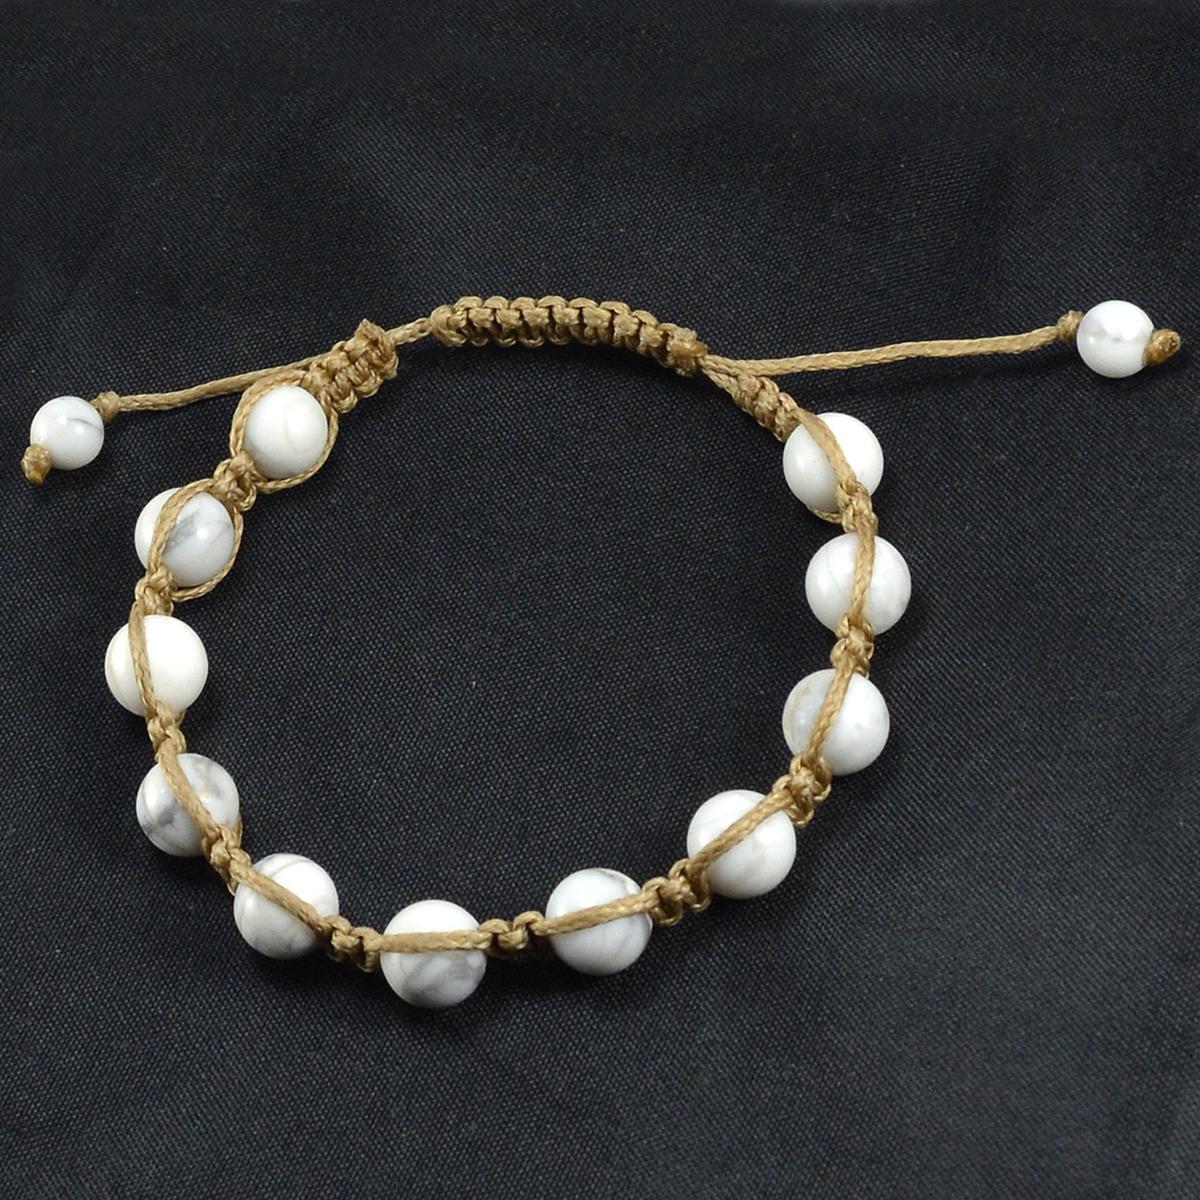 Handmade Jewelry Manufacturer Howlite Adjustable Shamballa Bracelet With Jaipur Rajasthan India Brown Cord